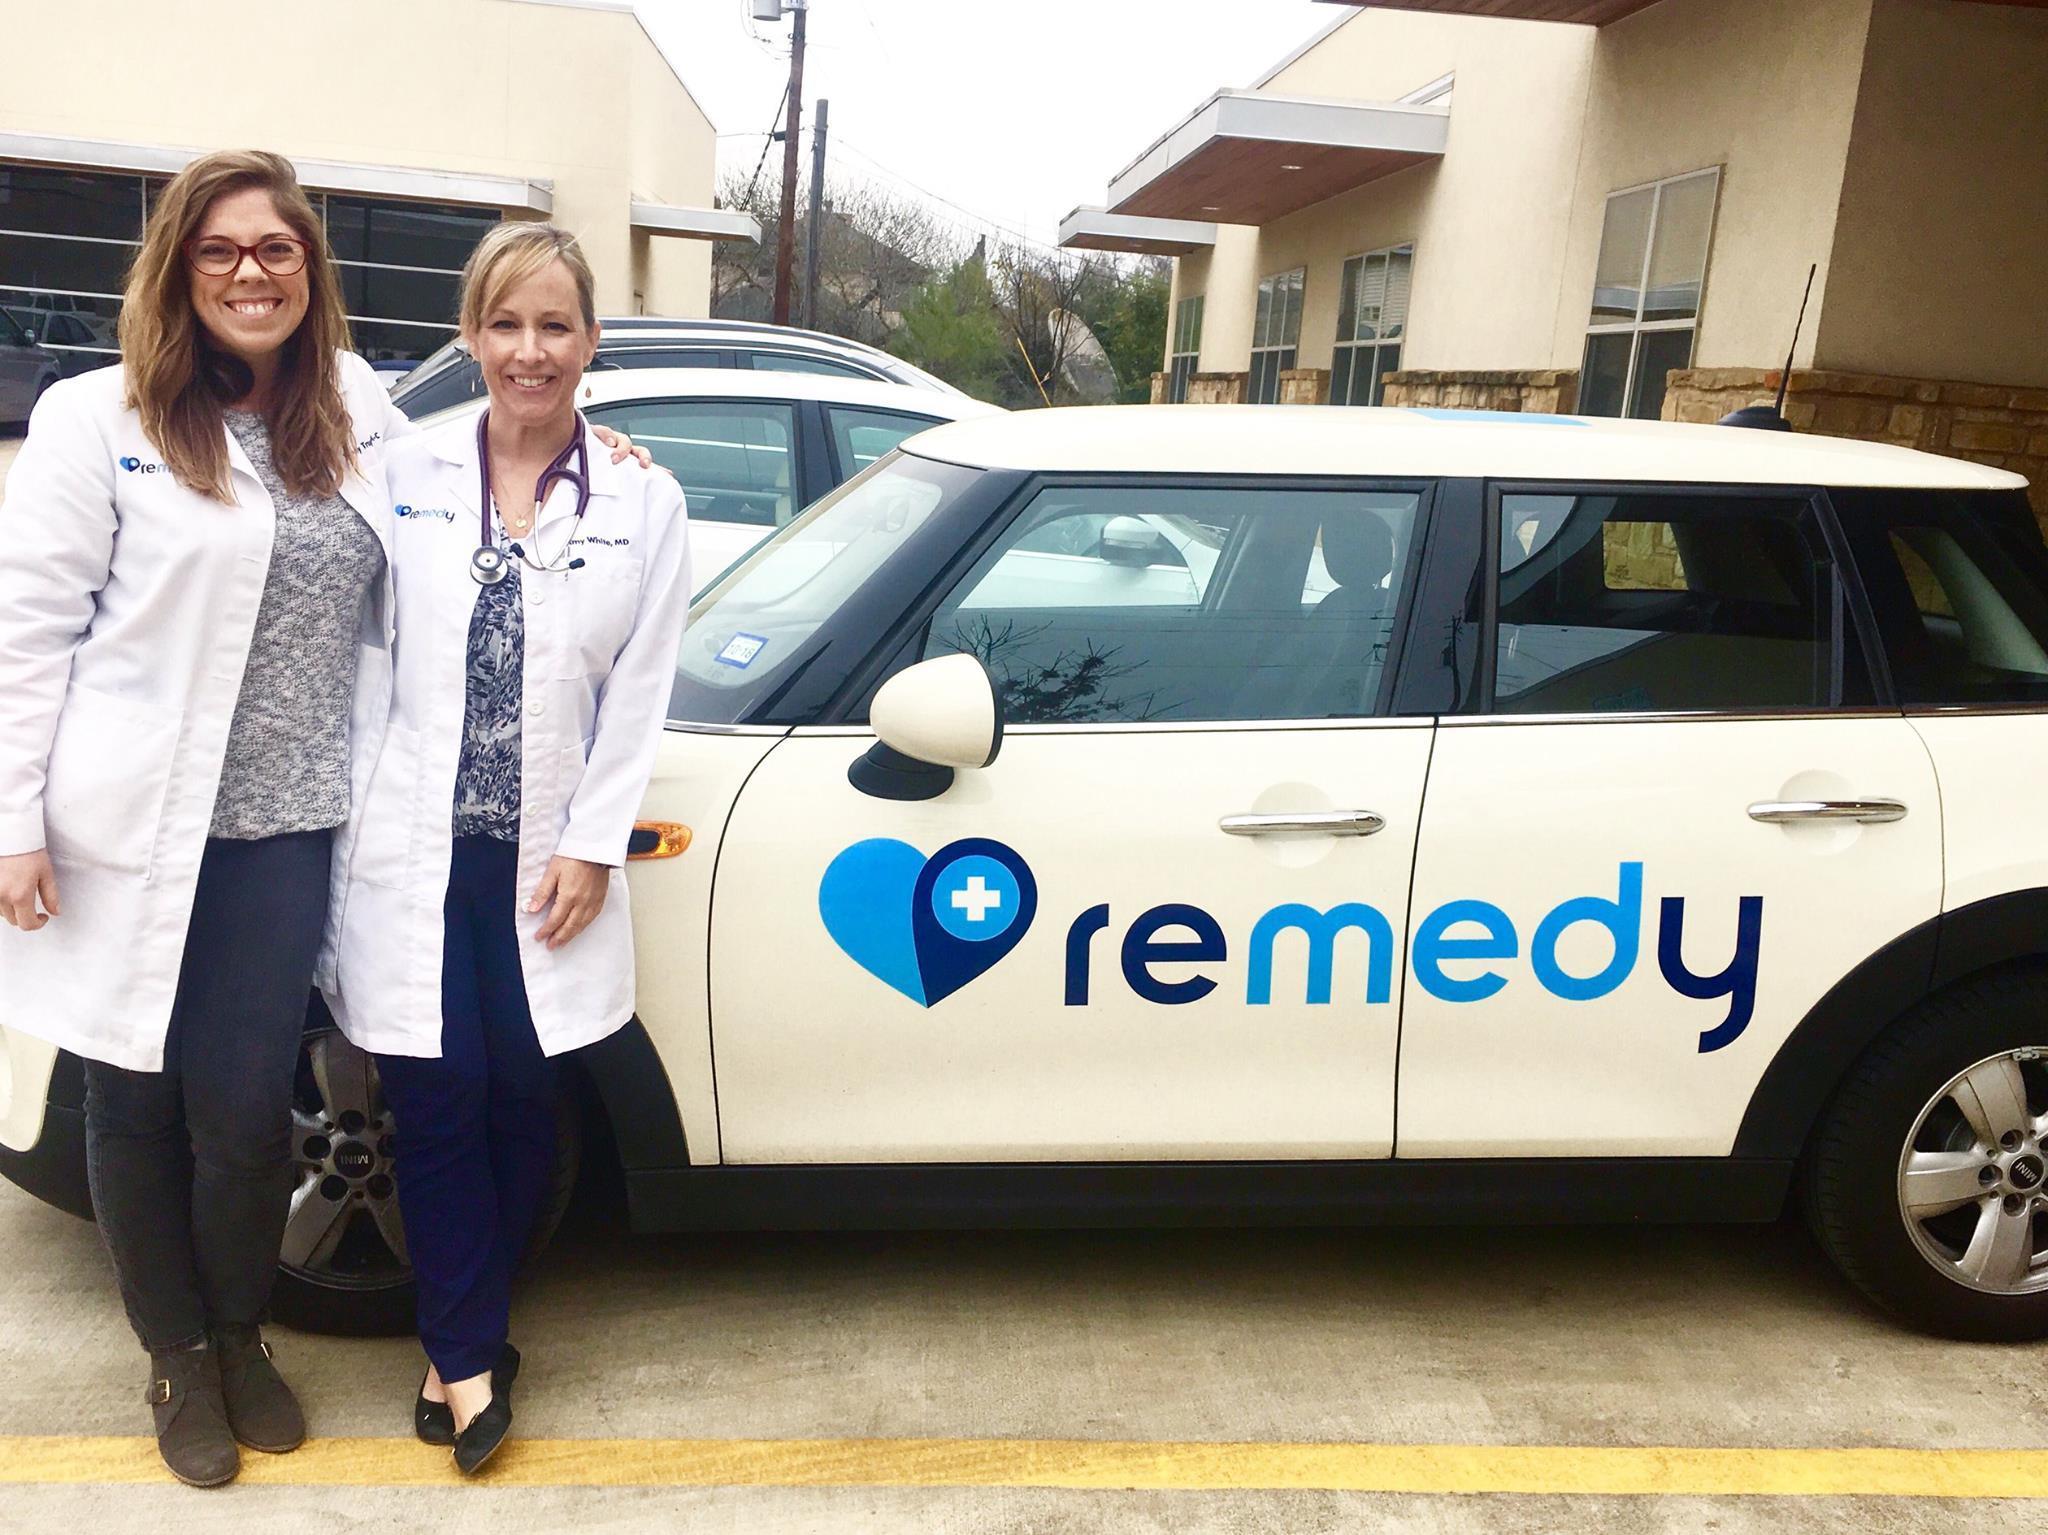 Remedy Urgent Care image 2